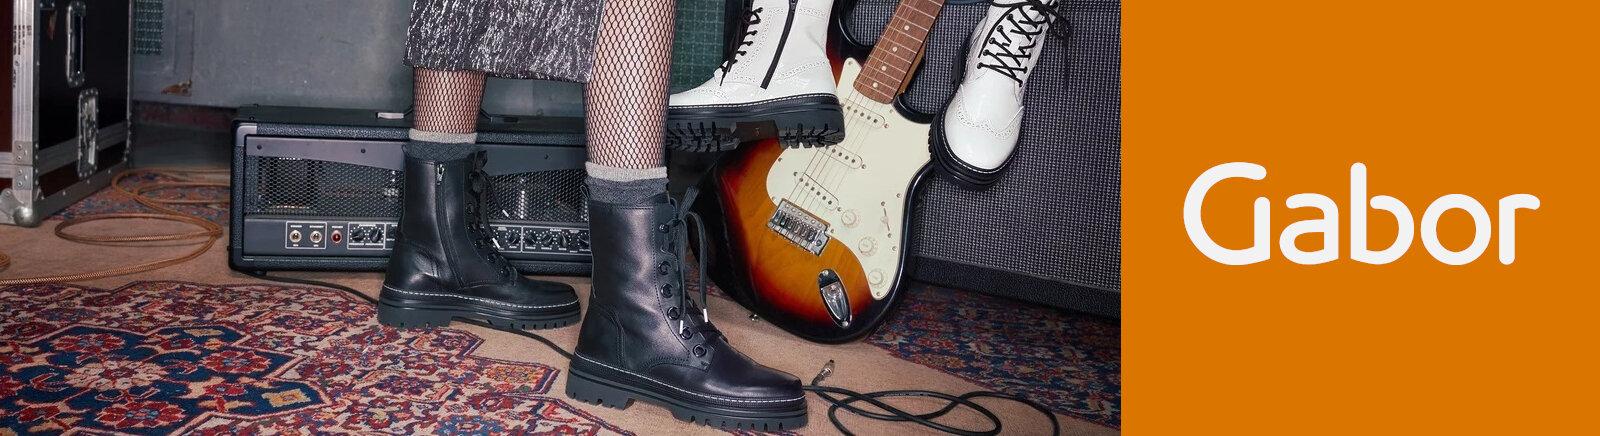 Juppen: Gabor Biker Boots für Damen online shoppen